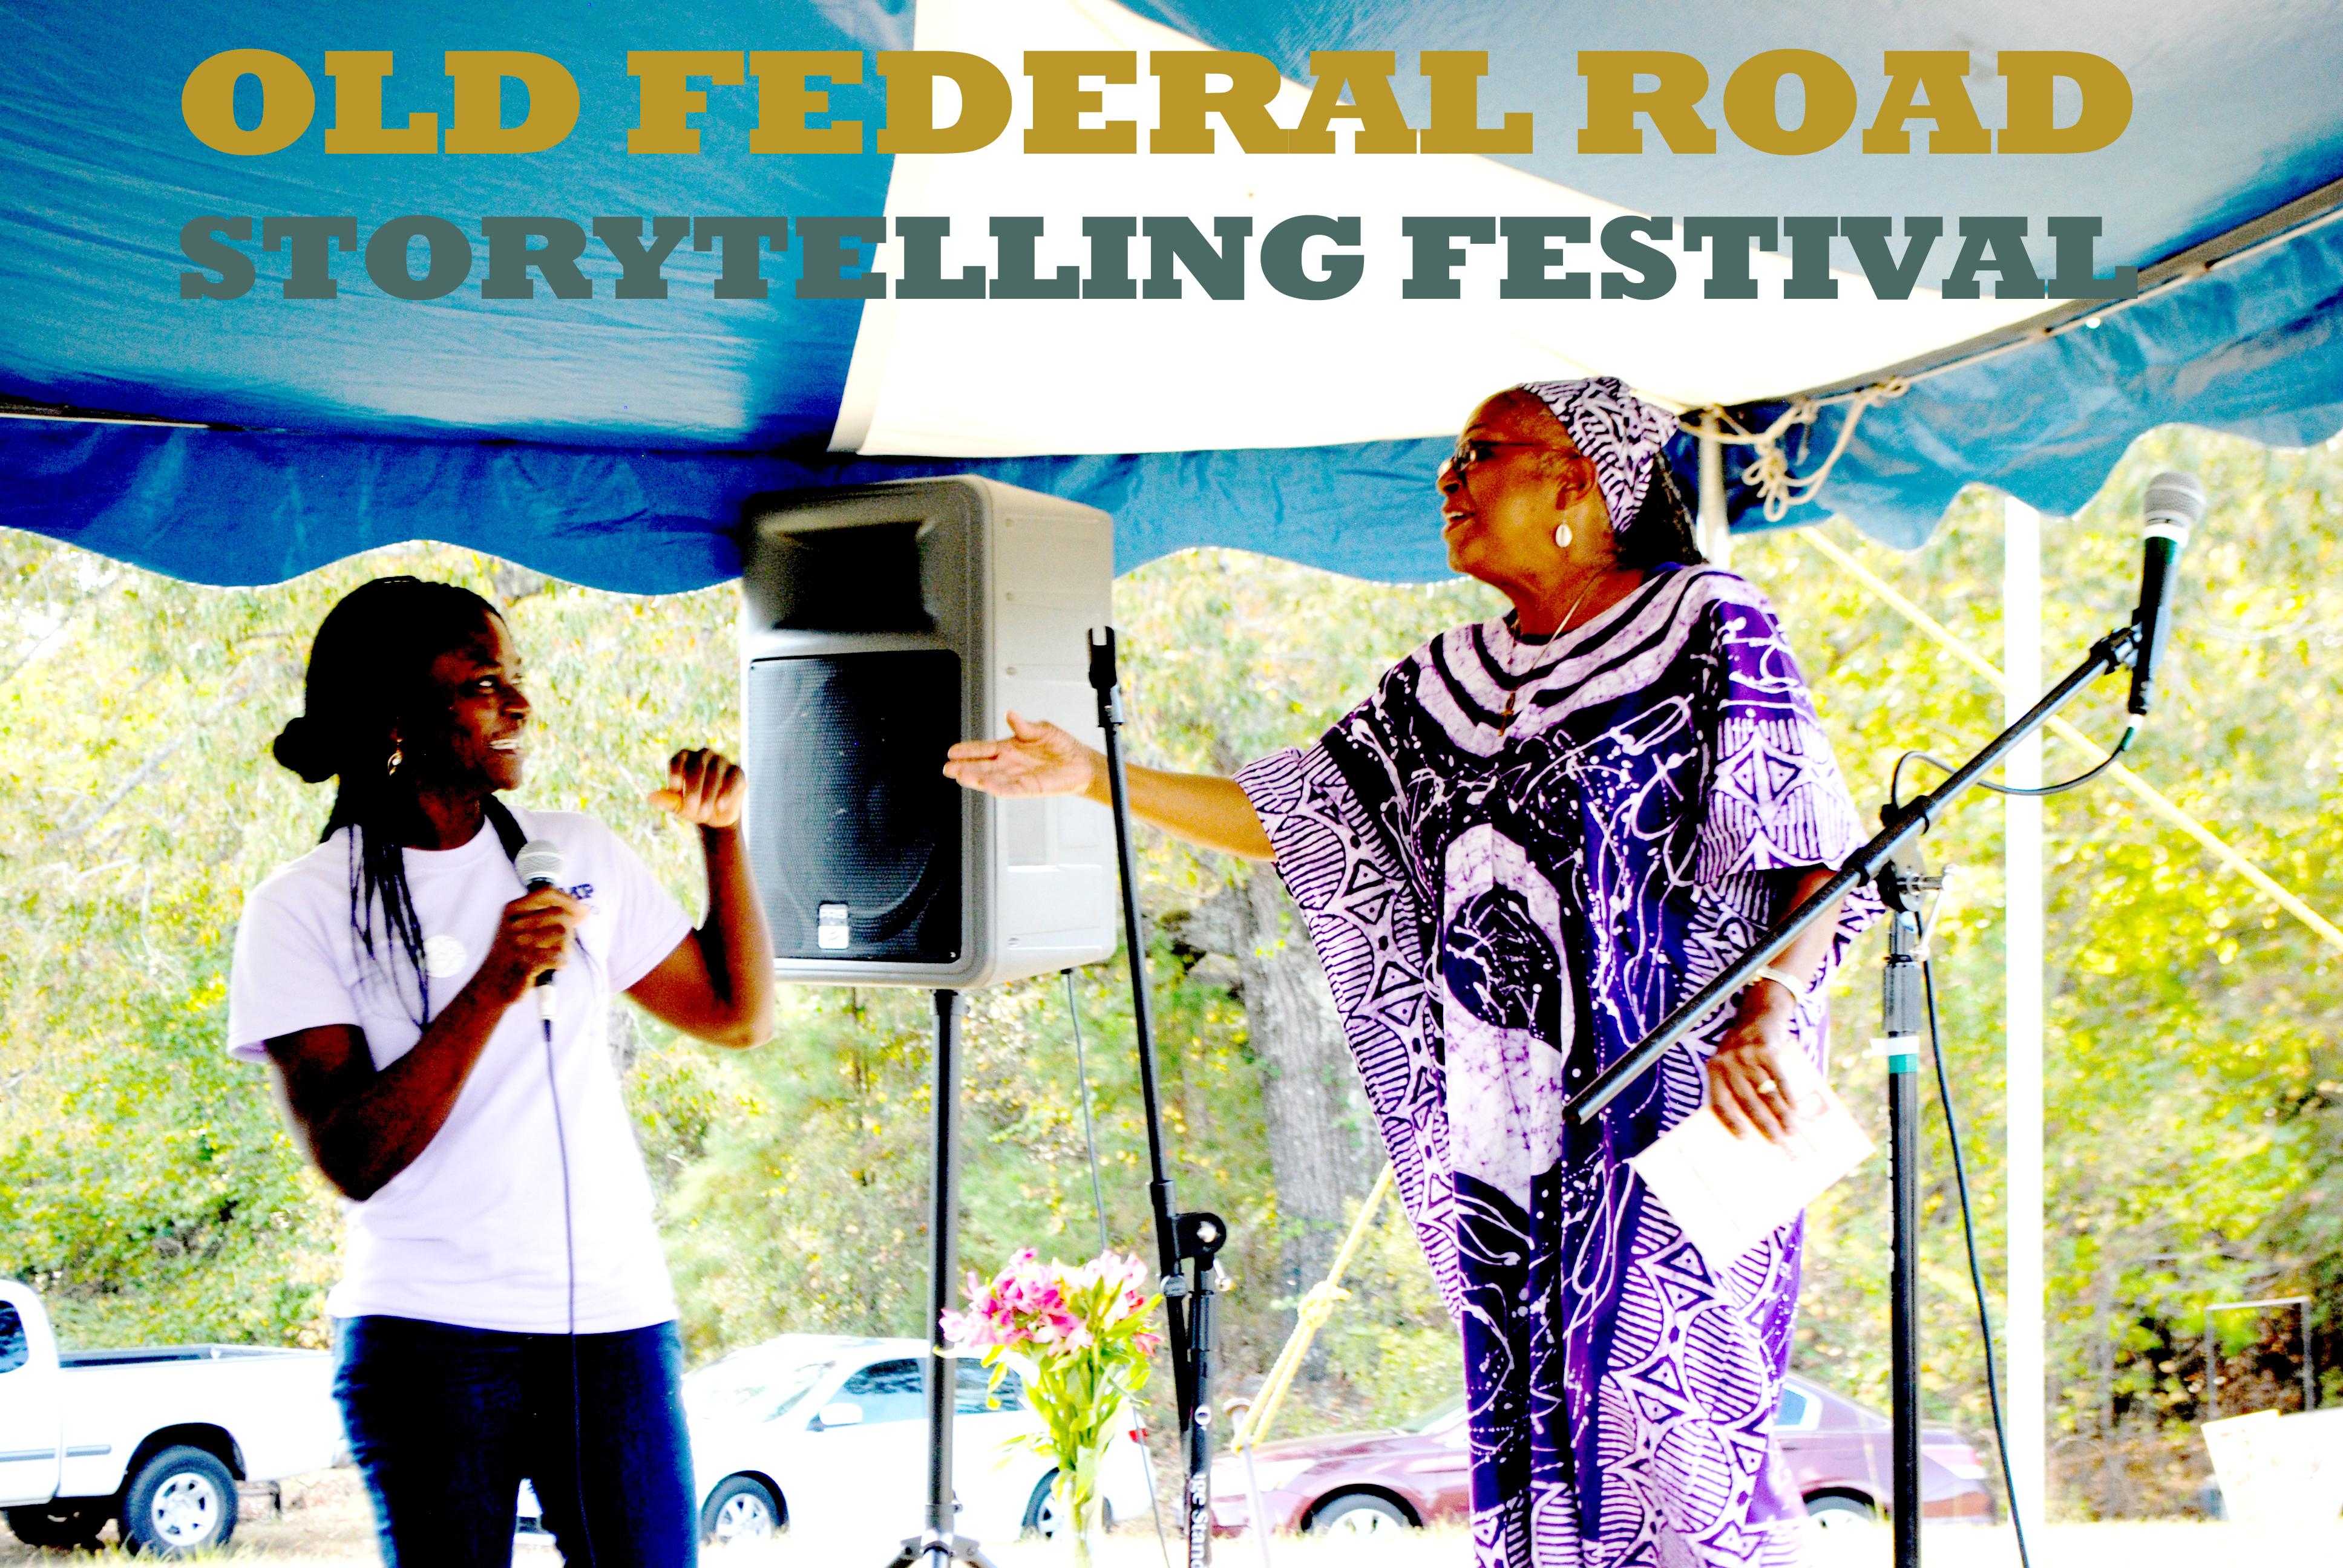 2019 Old Federal Road Storytelling Festival